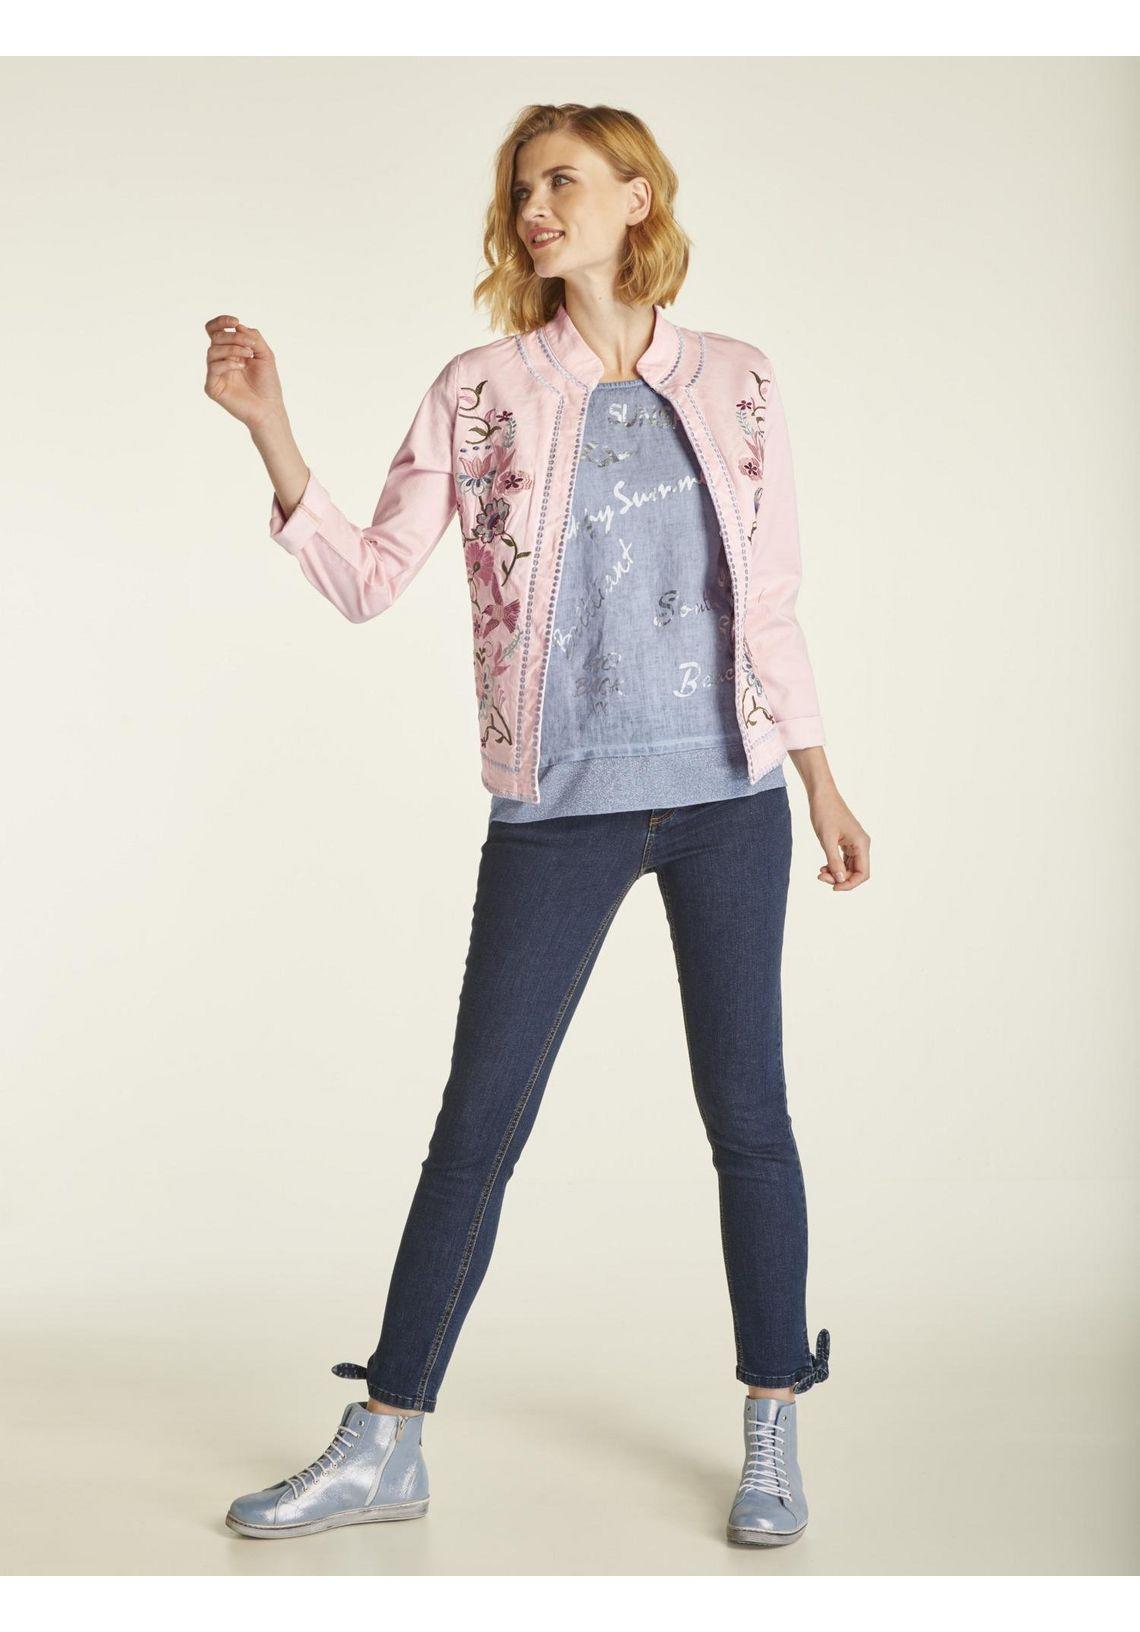 Blouse Koop Je Bij Jeansblauw YjOjynXT